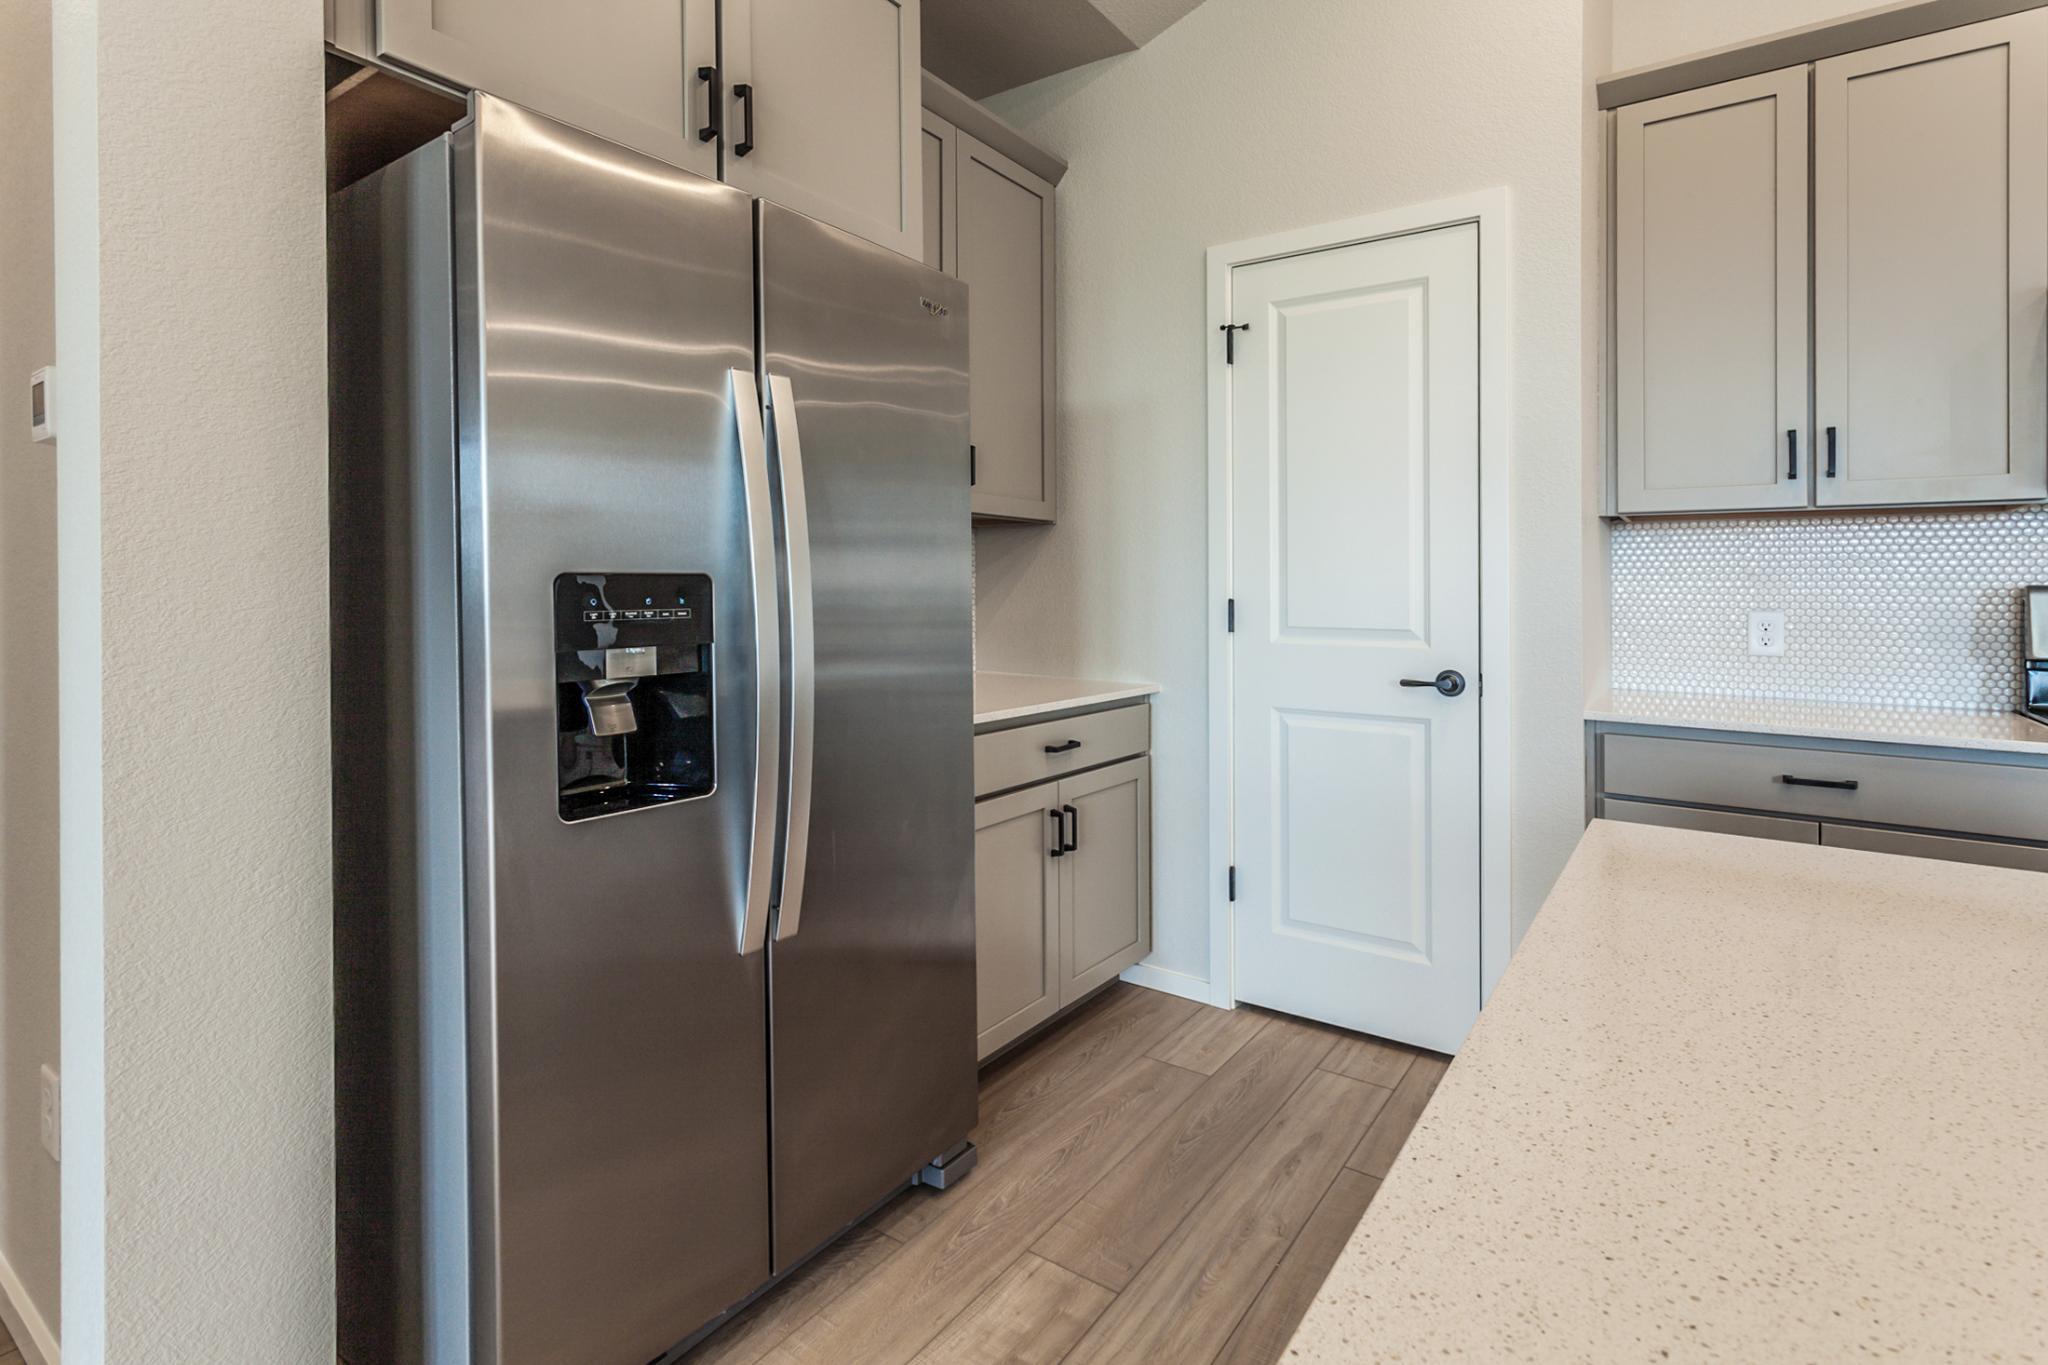 Kitchen featured in The Vanderbilt By Hartford Homes in Fort Collins-Loveland, CO